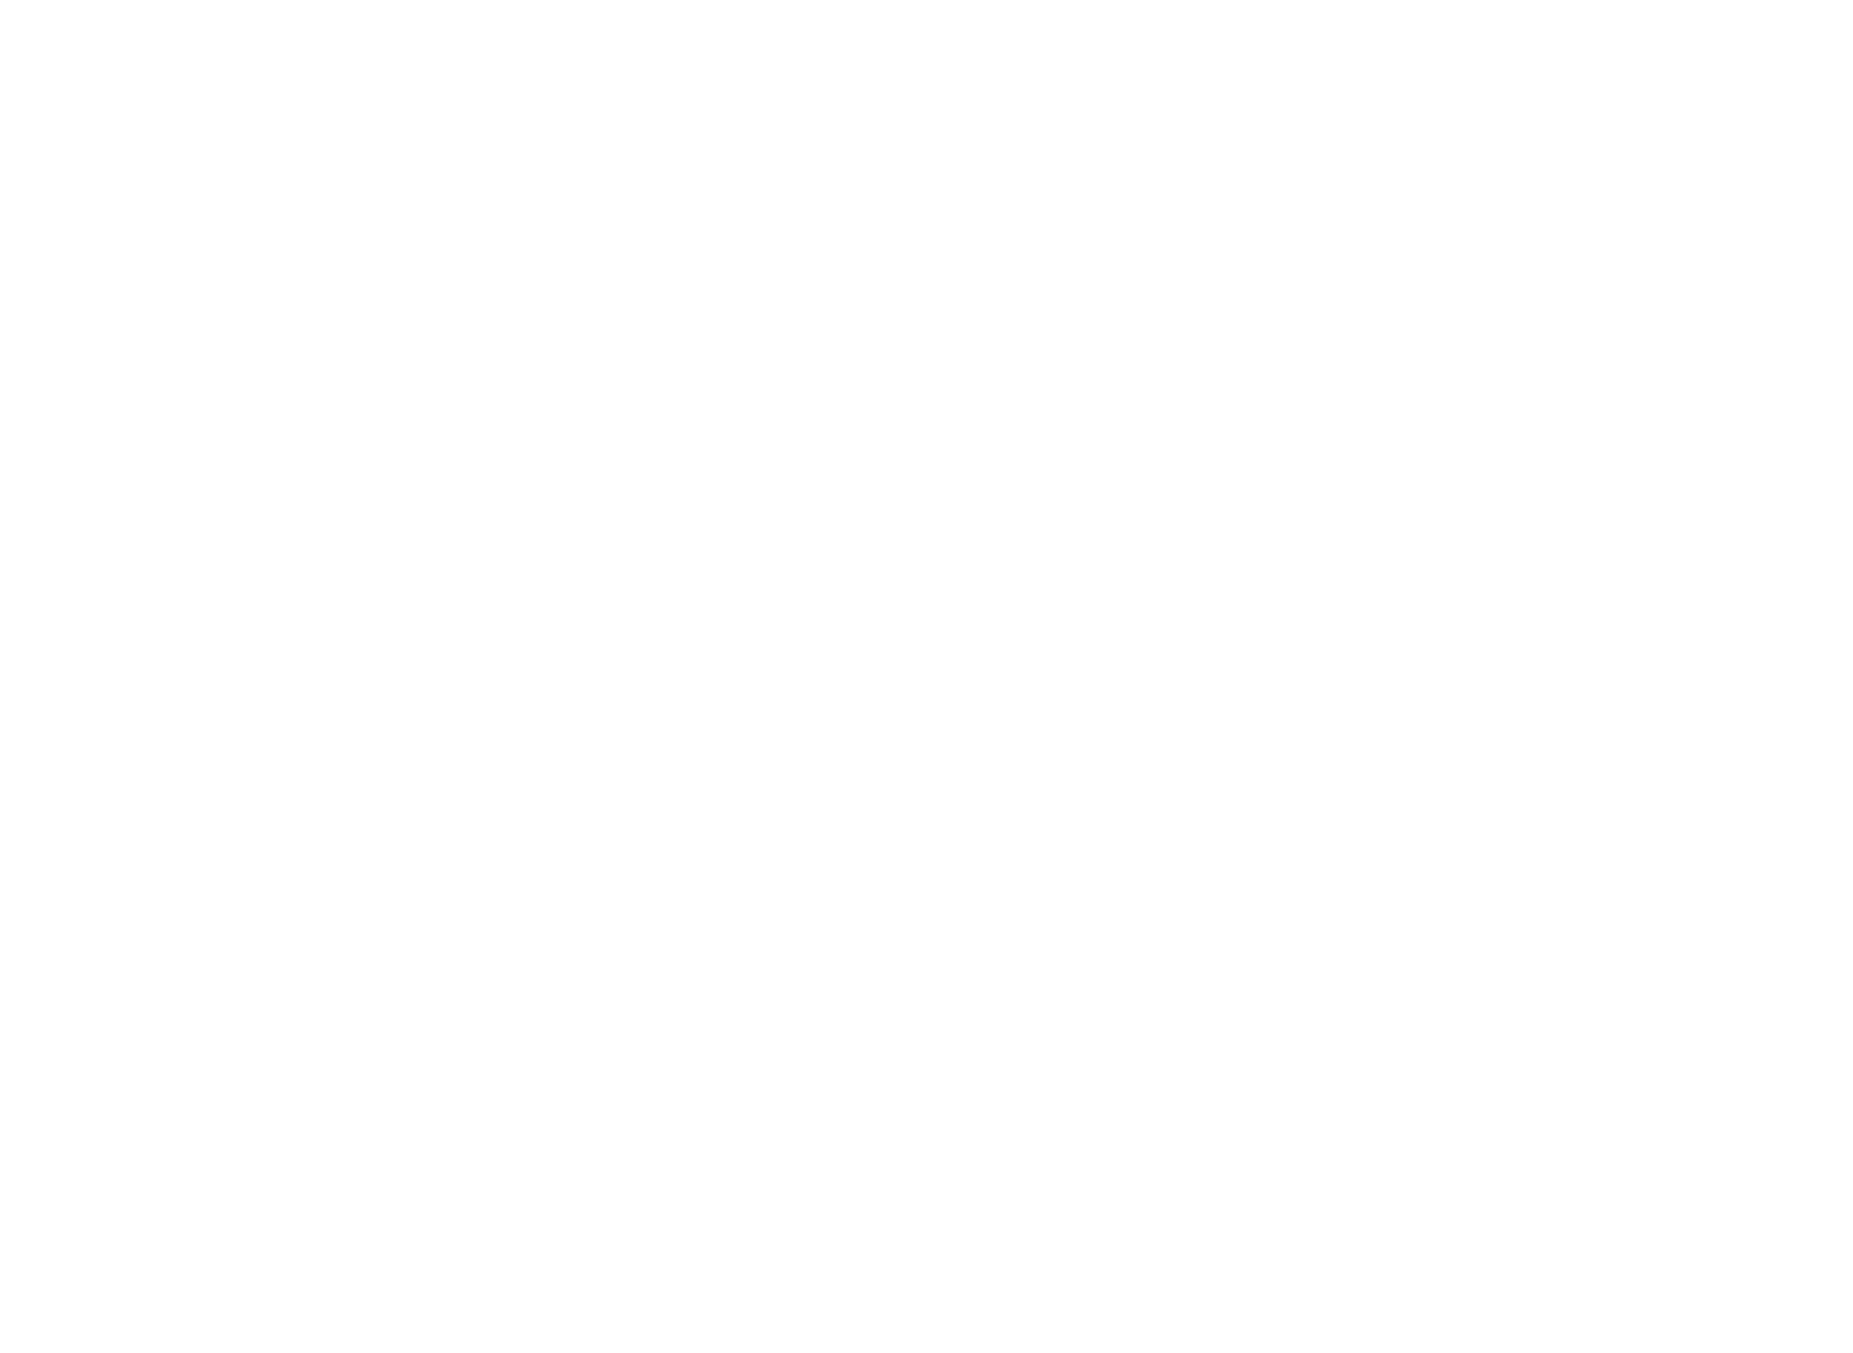 Excellence Green Awards